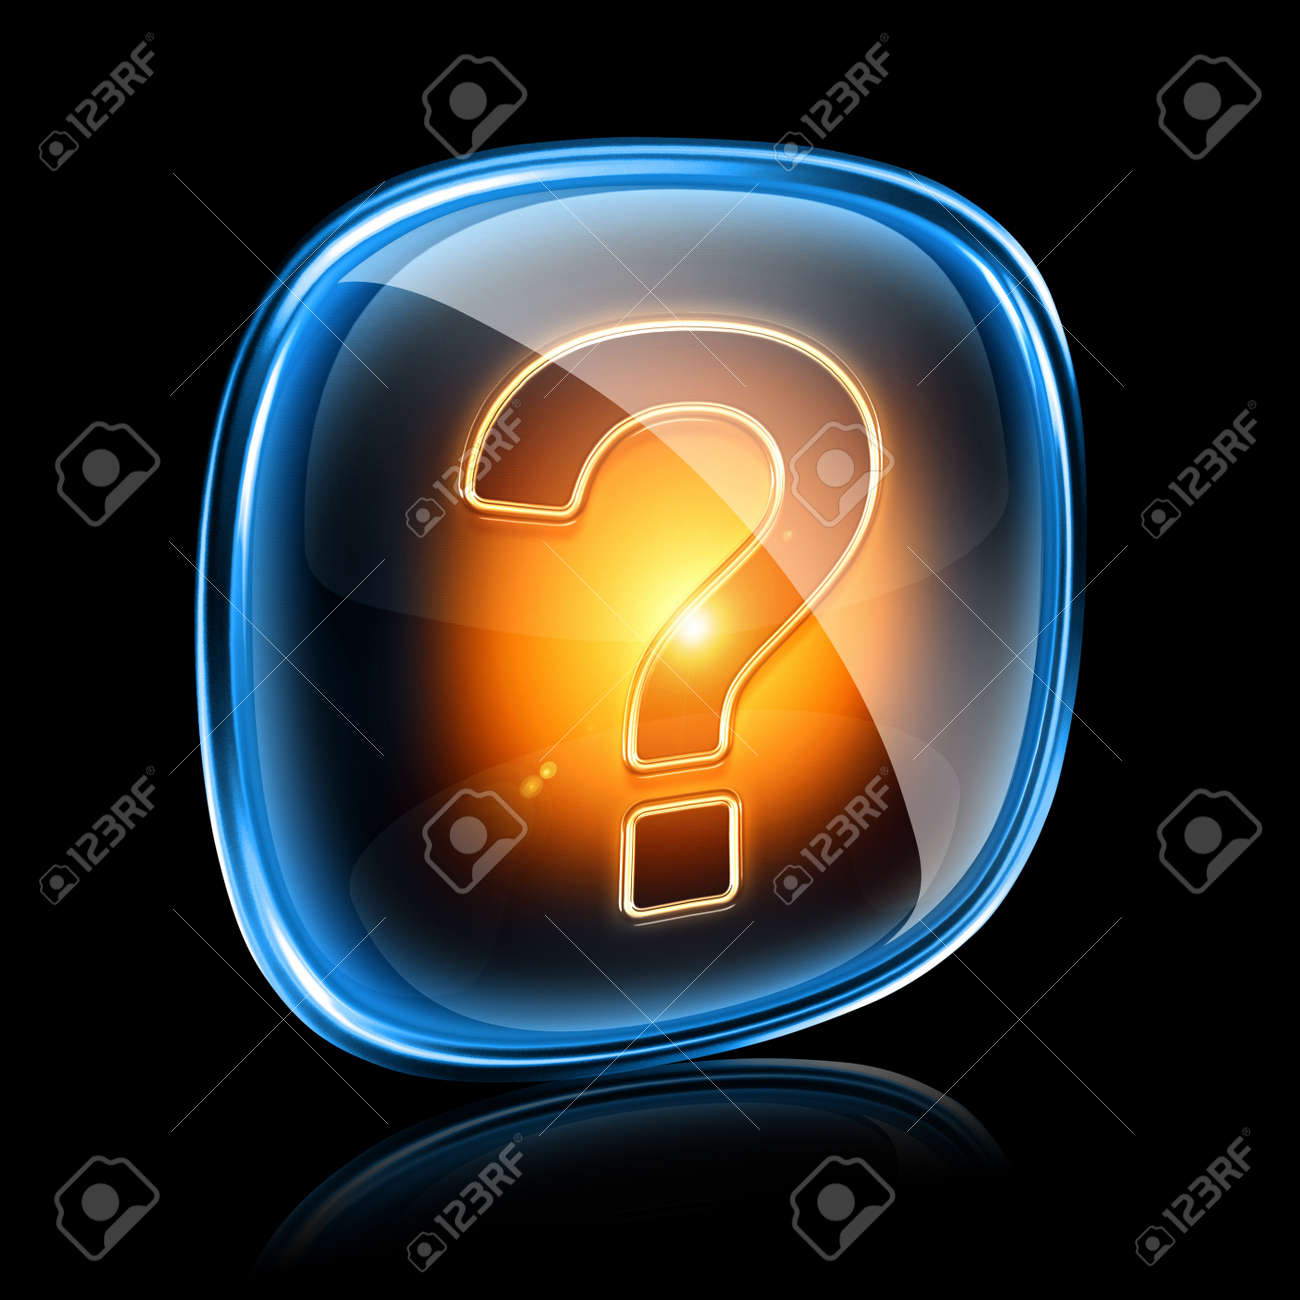 Help icon neon, isolated on black background Stock Photo - 11504126